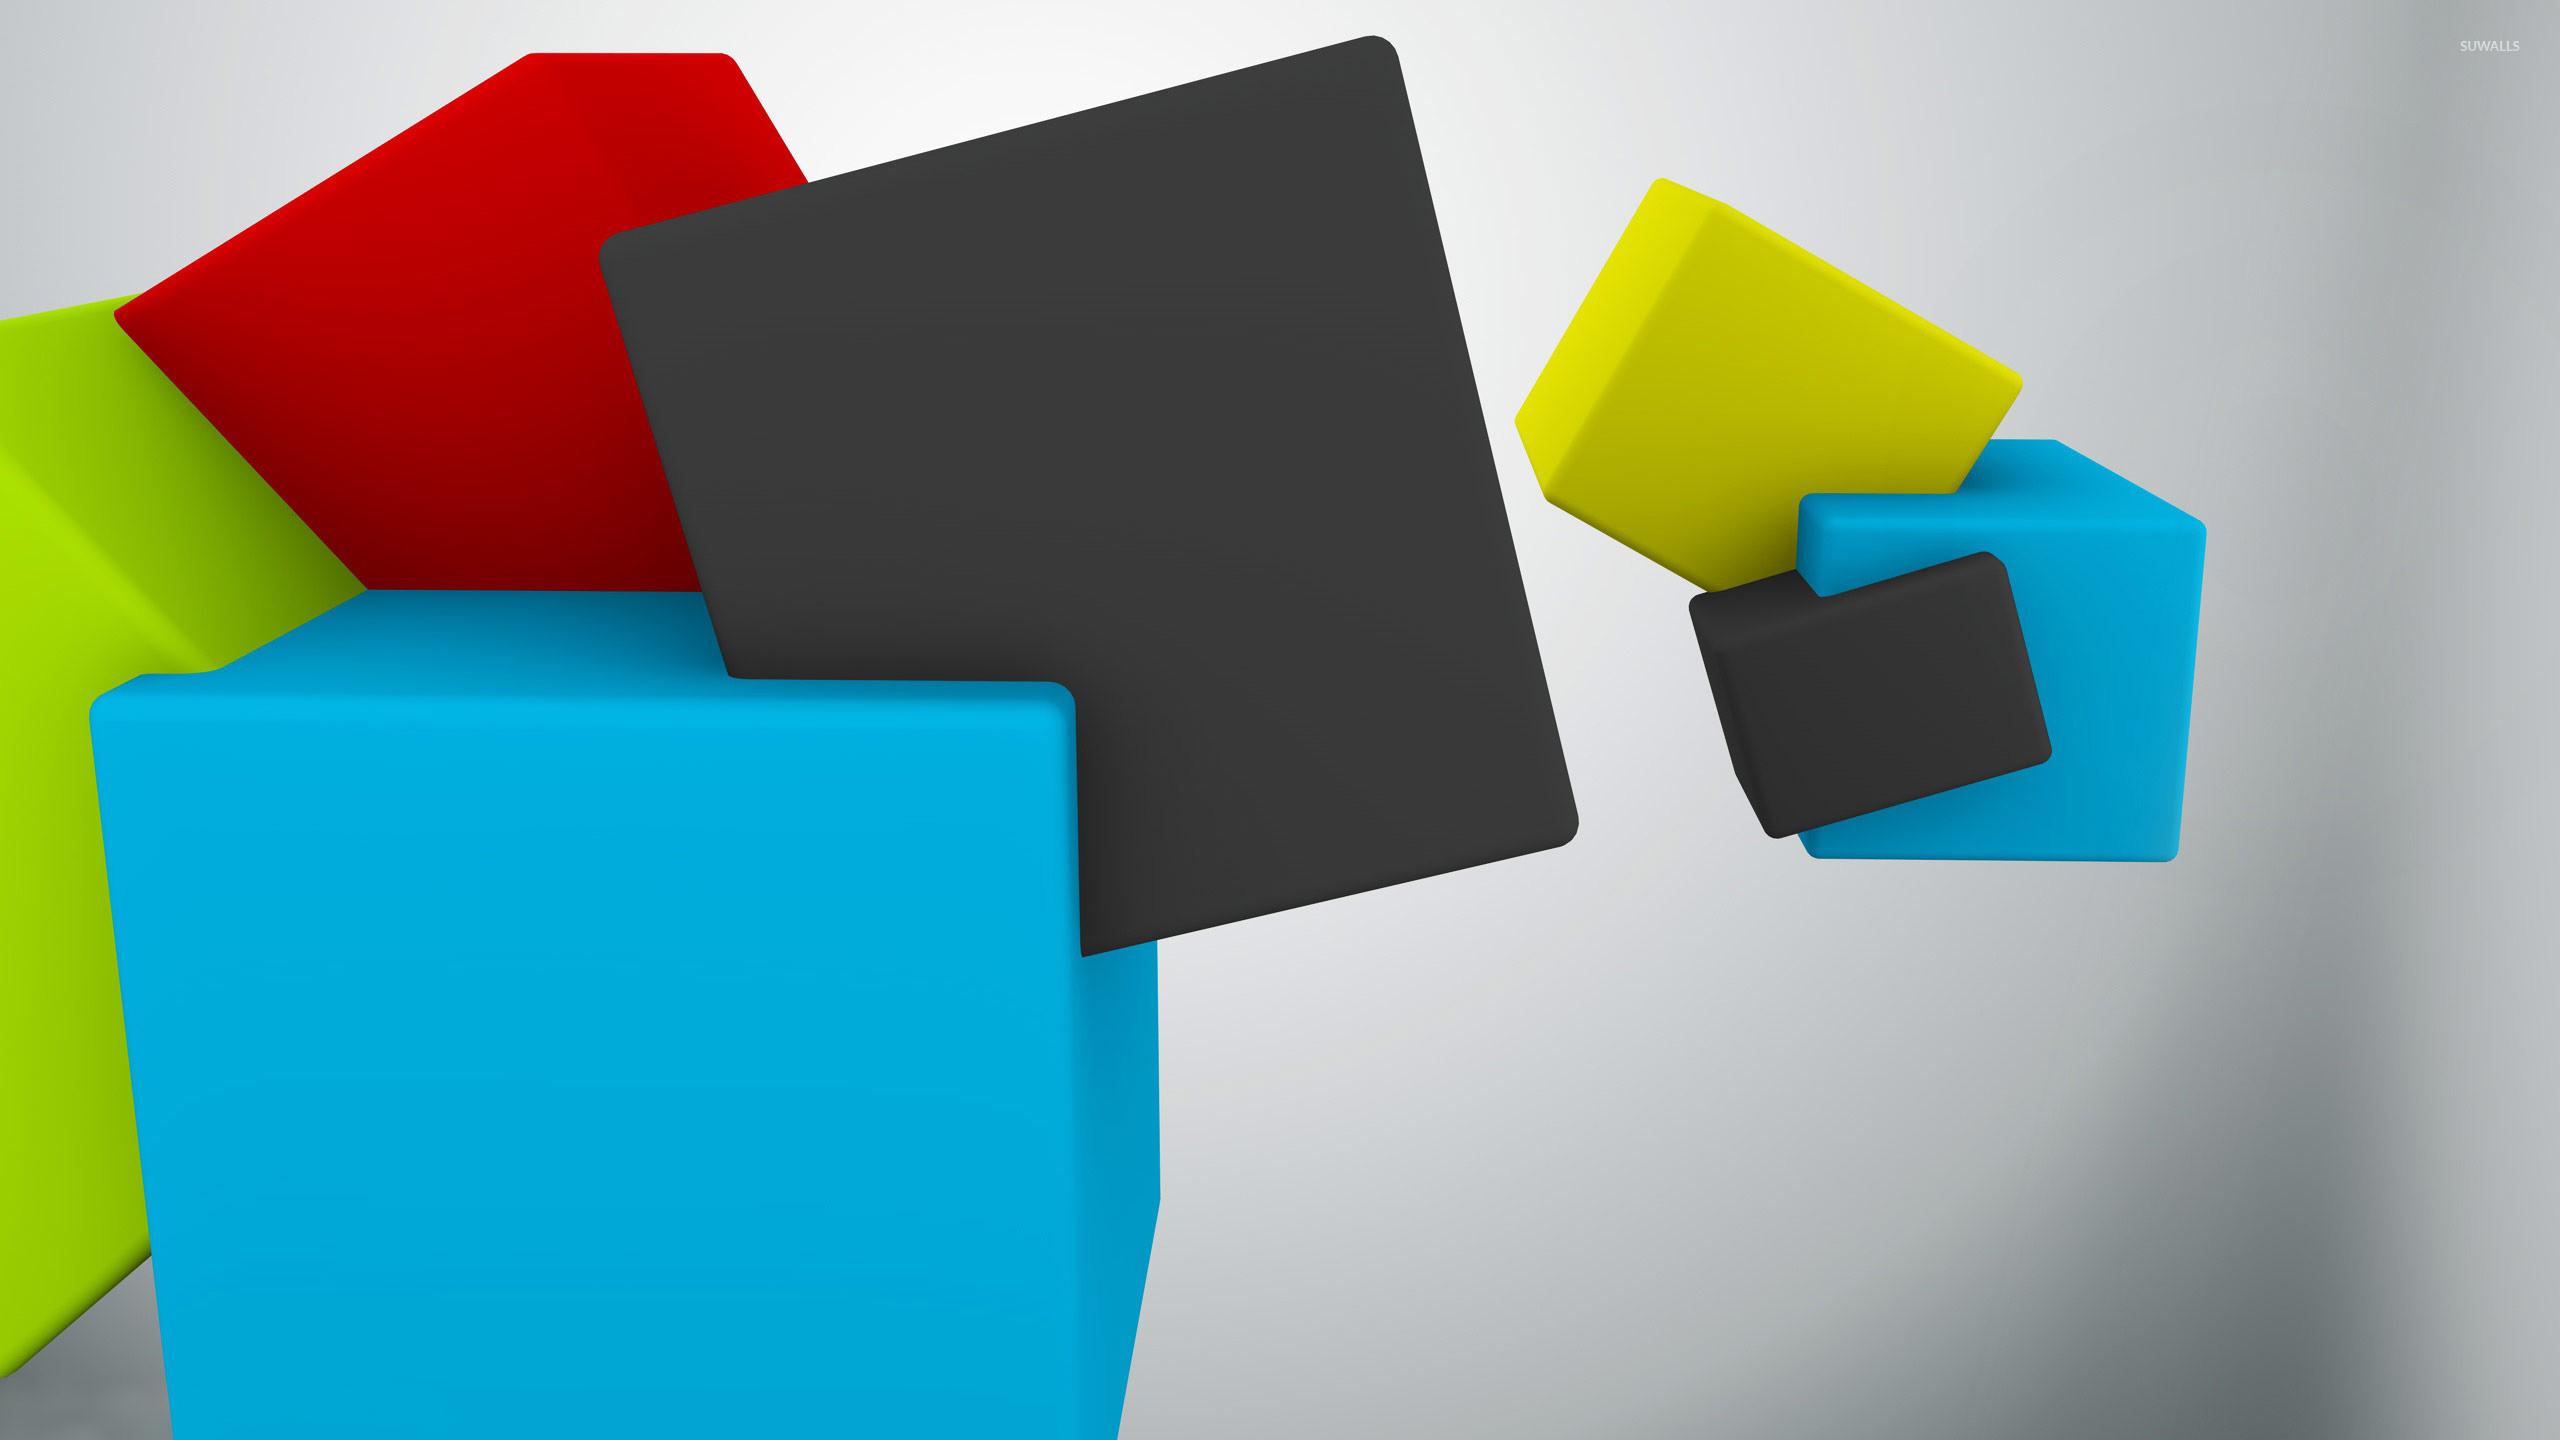 Colorful cubes [2] wallpaper jpg